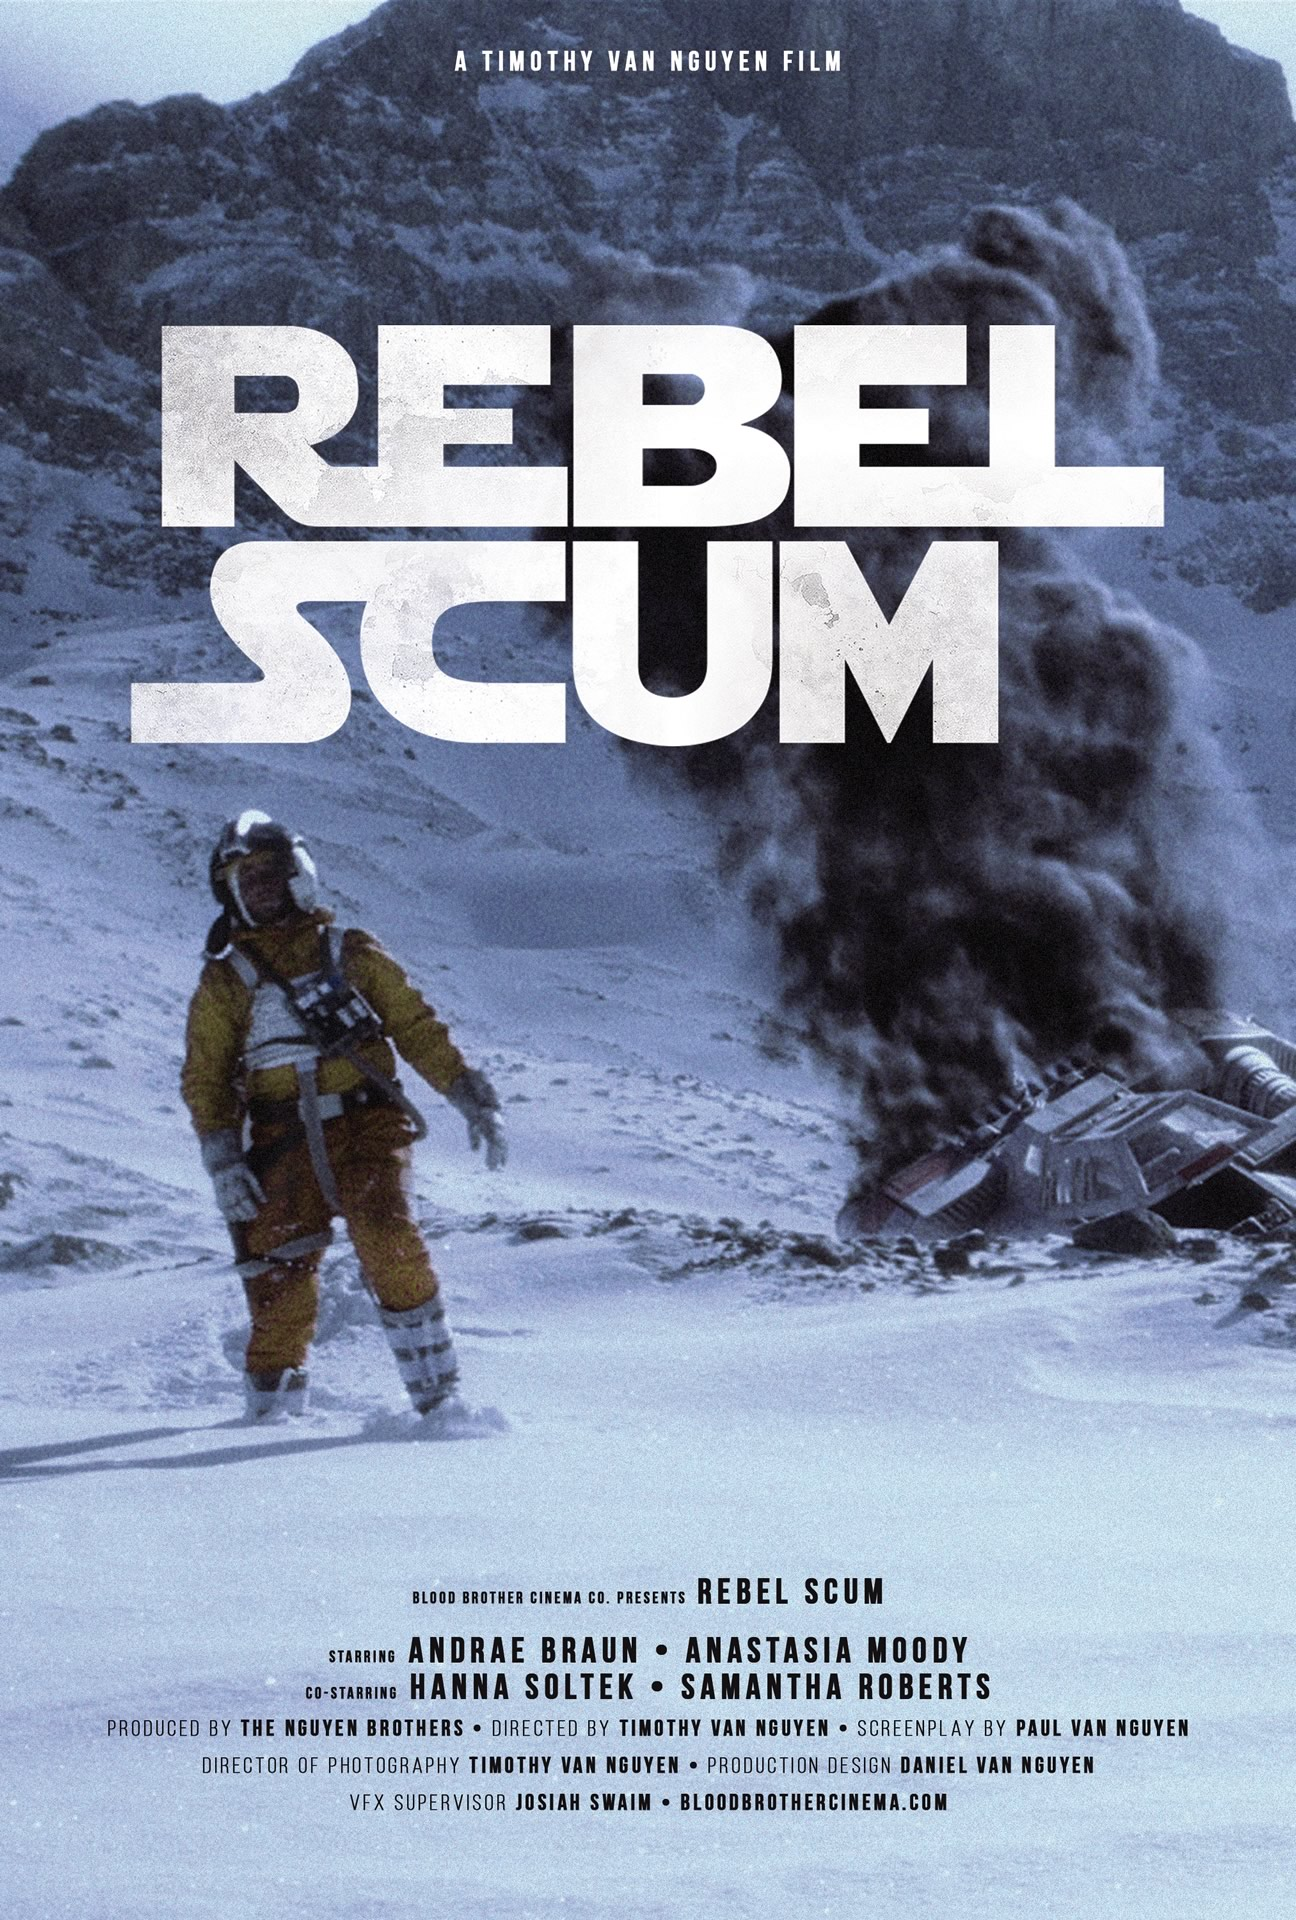 REBEL SCUM - Fan Film de 2016 de Star Wars da  Blood Brother Cinema Co.